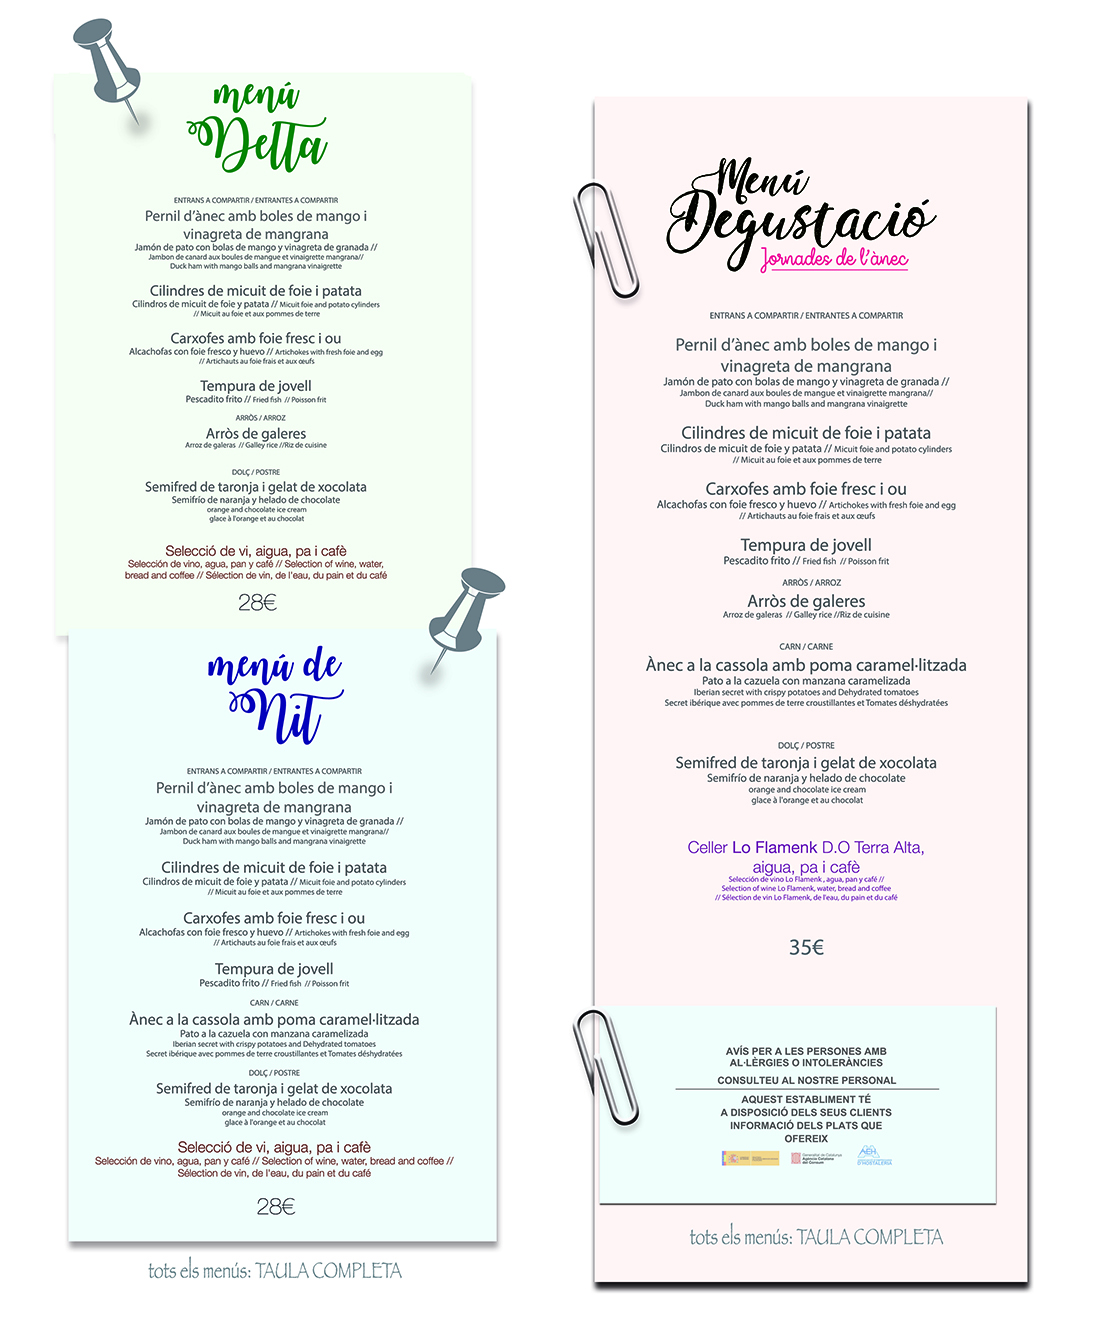 carta restaurant des 2017